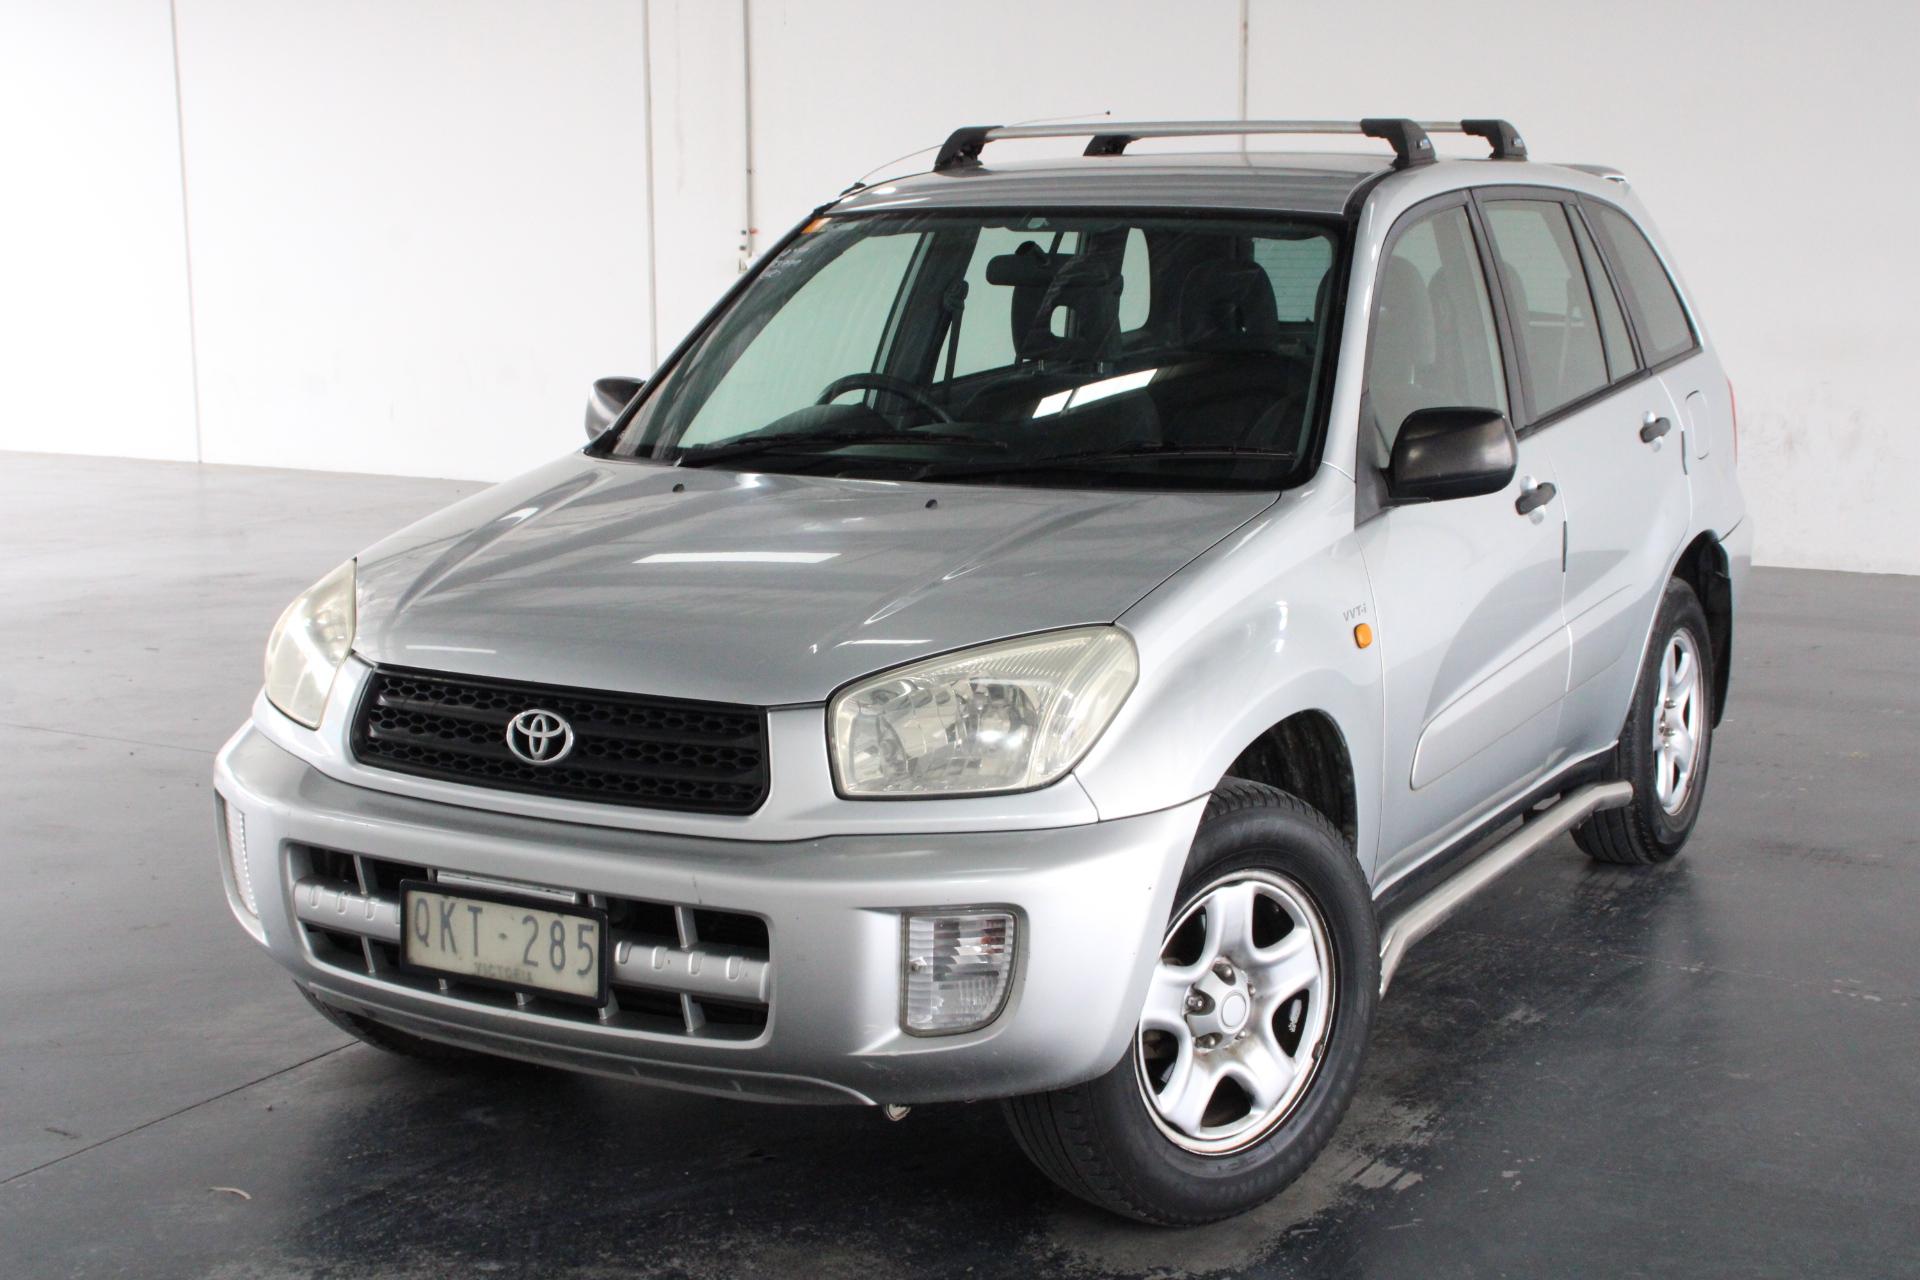 2000 Toyota Rav 4 Edge (4x4) Automatic Wagon